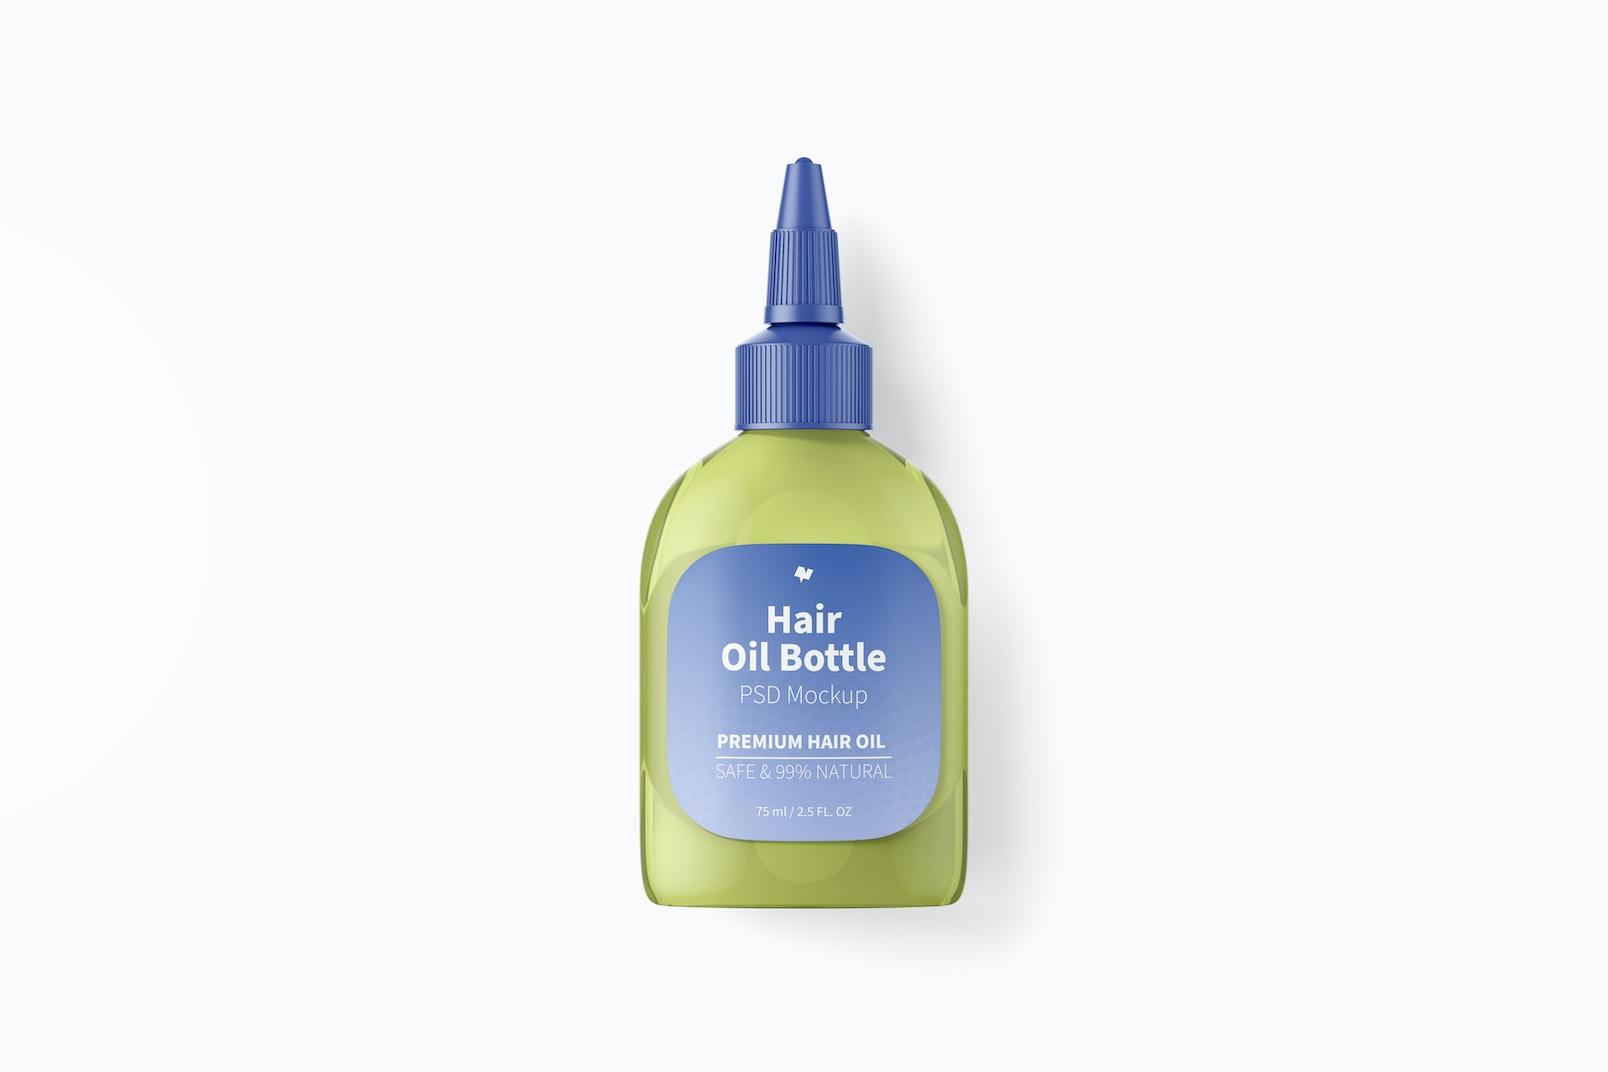 Hair Oil Bottle Mockup, Top View